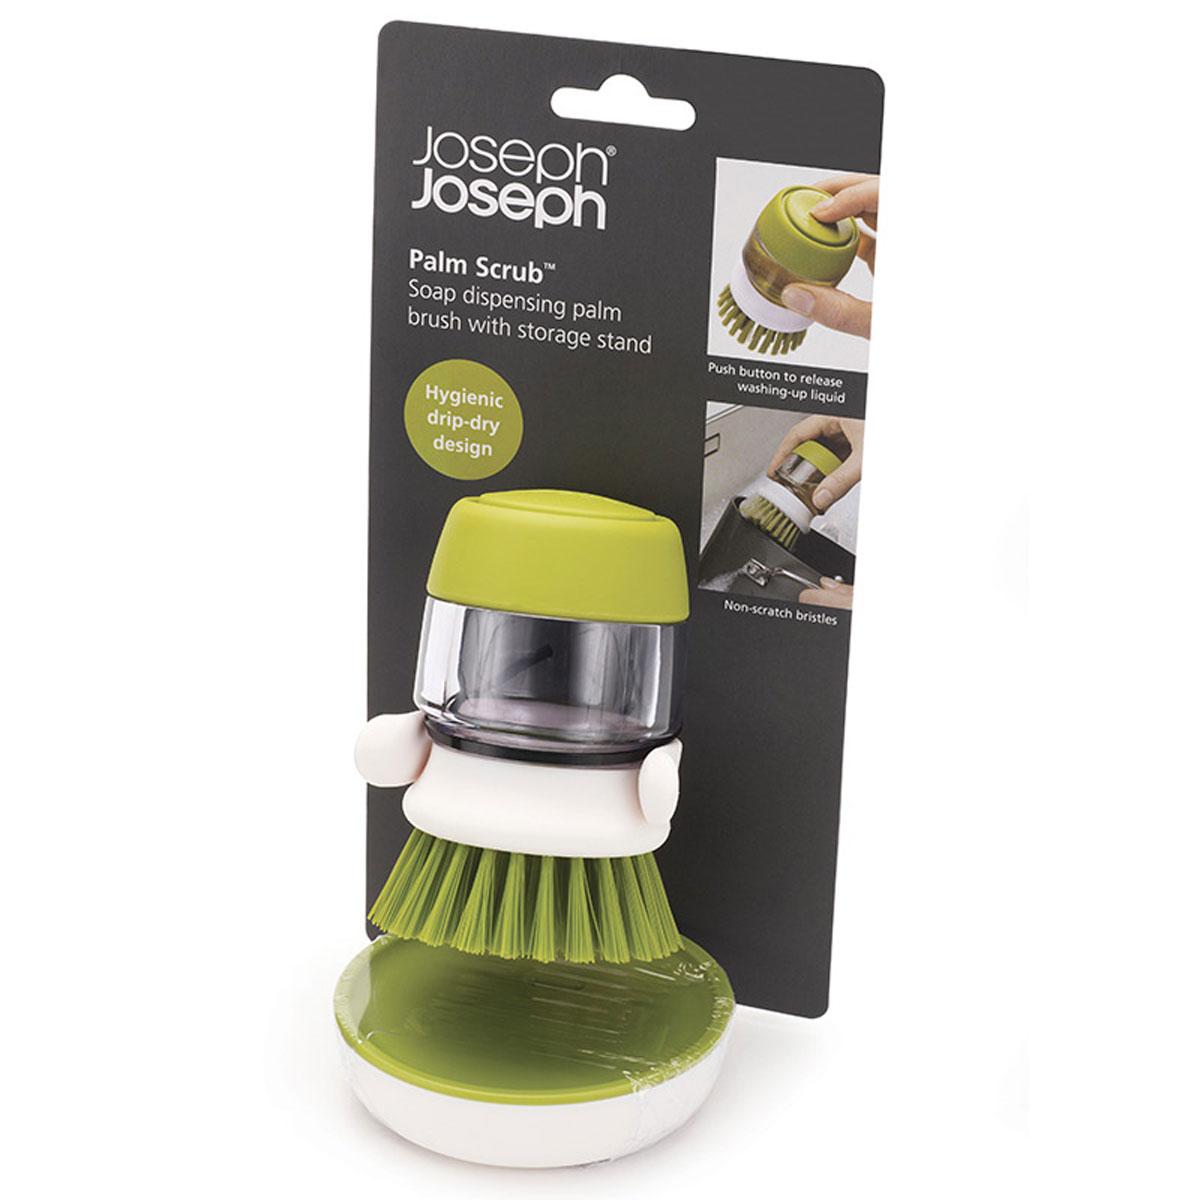 Щетка Joseph Joseph Palm Scrub, с дозатором моющего средства, цвет: зеленый, 9 см х 7 см